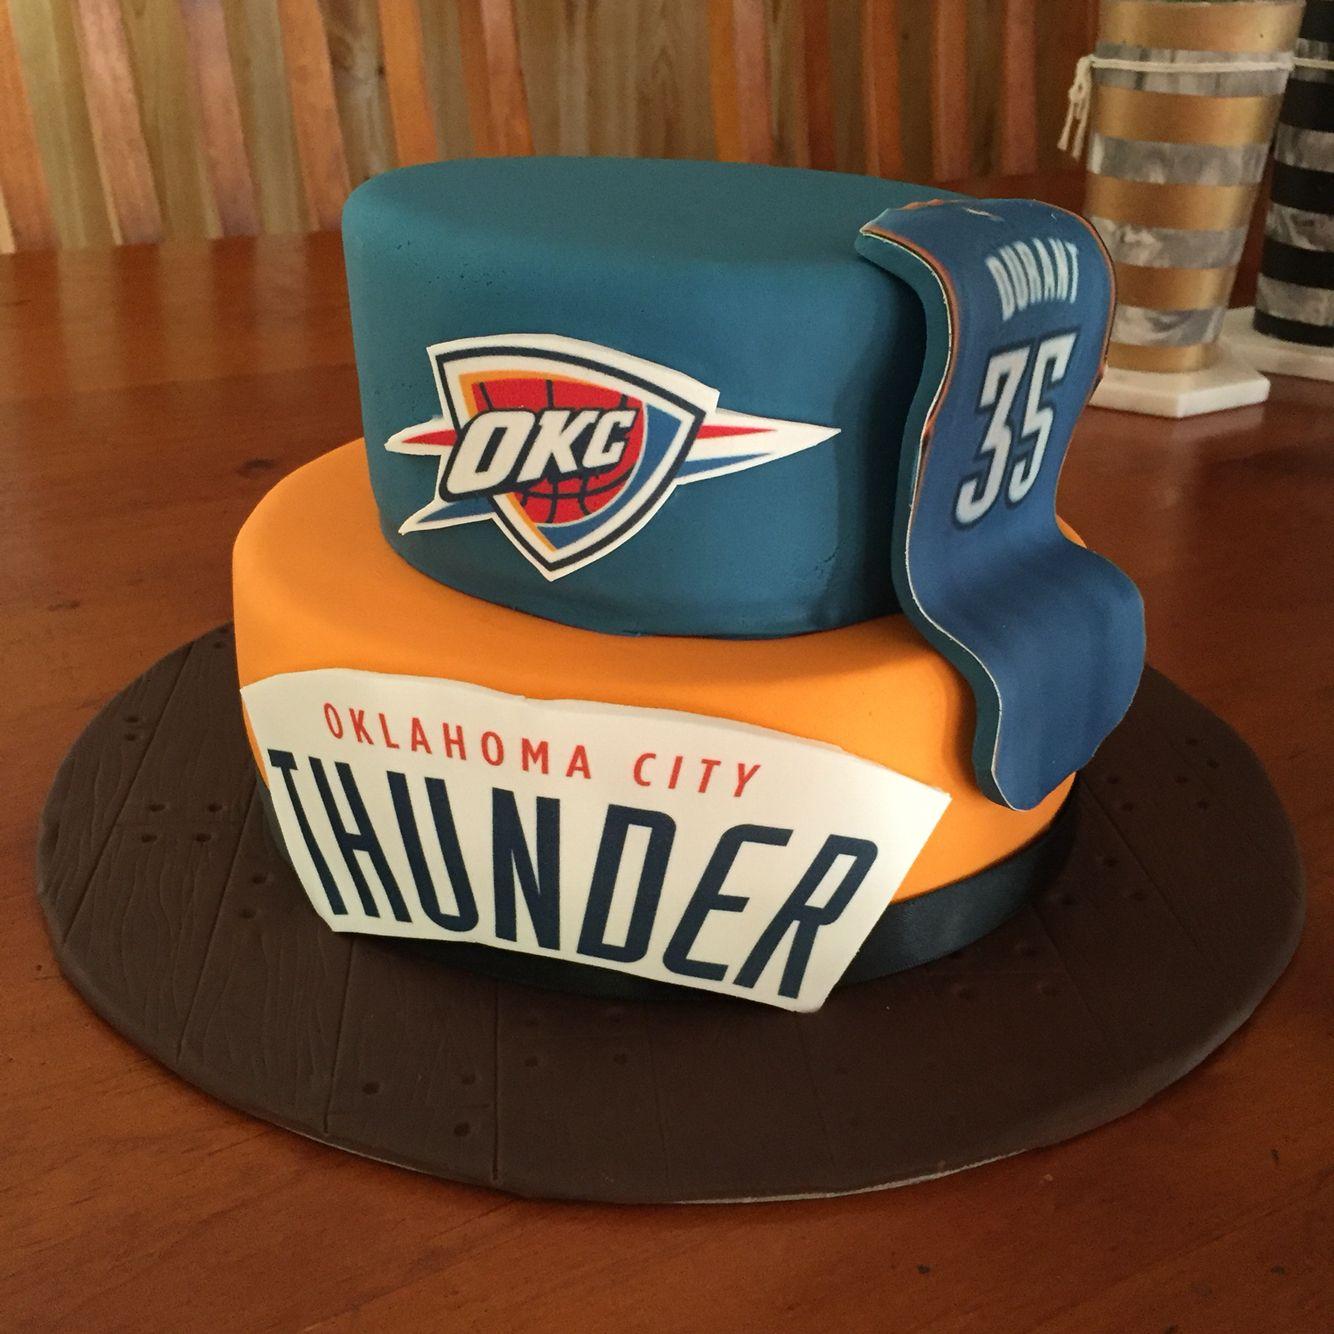 Peachy Oklahoma City Thunder Nba Kevin Durant Birthday Cake Chocolate Funny Birthday Cards Online Inifofree Goldxyz